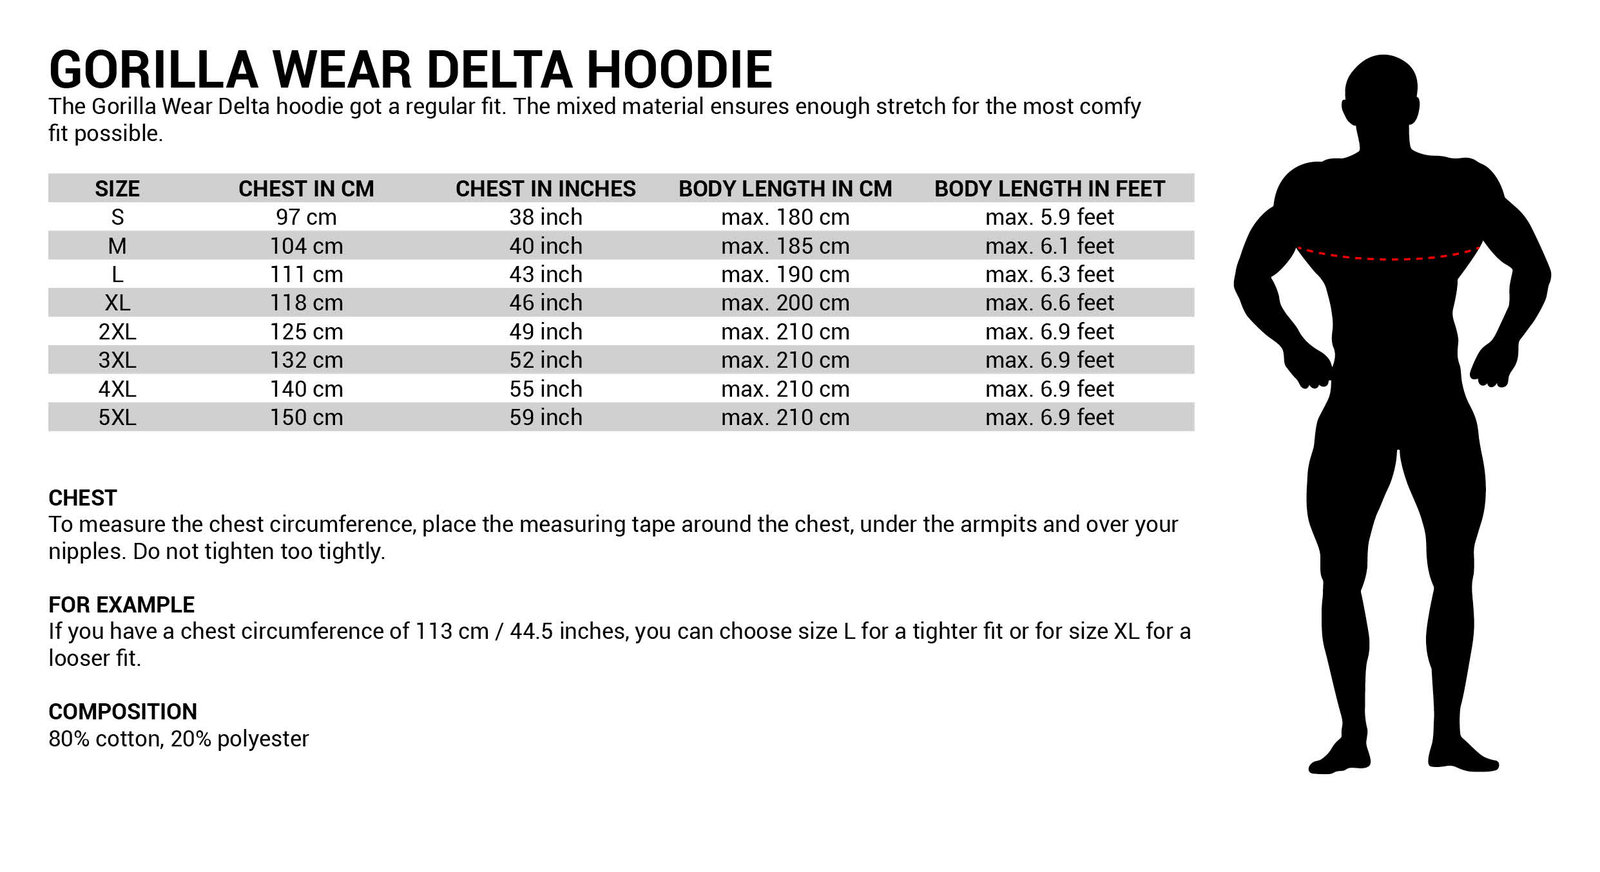 Gorilla Wear Delta Hoodie Hoodie Hoodie Bodybuilding Fitness a4b7d6